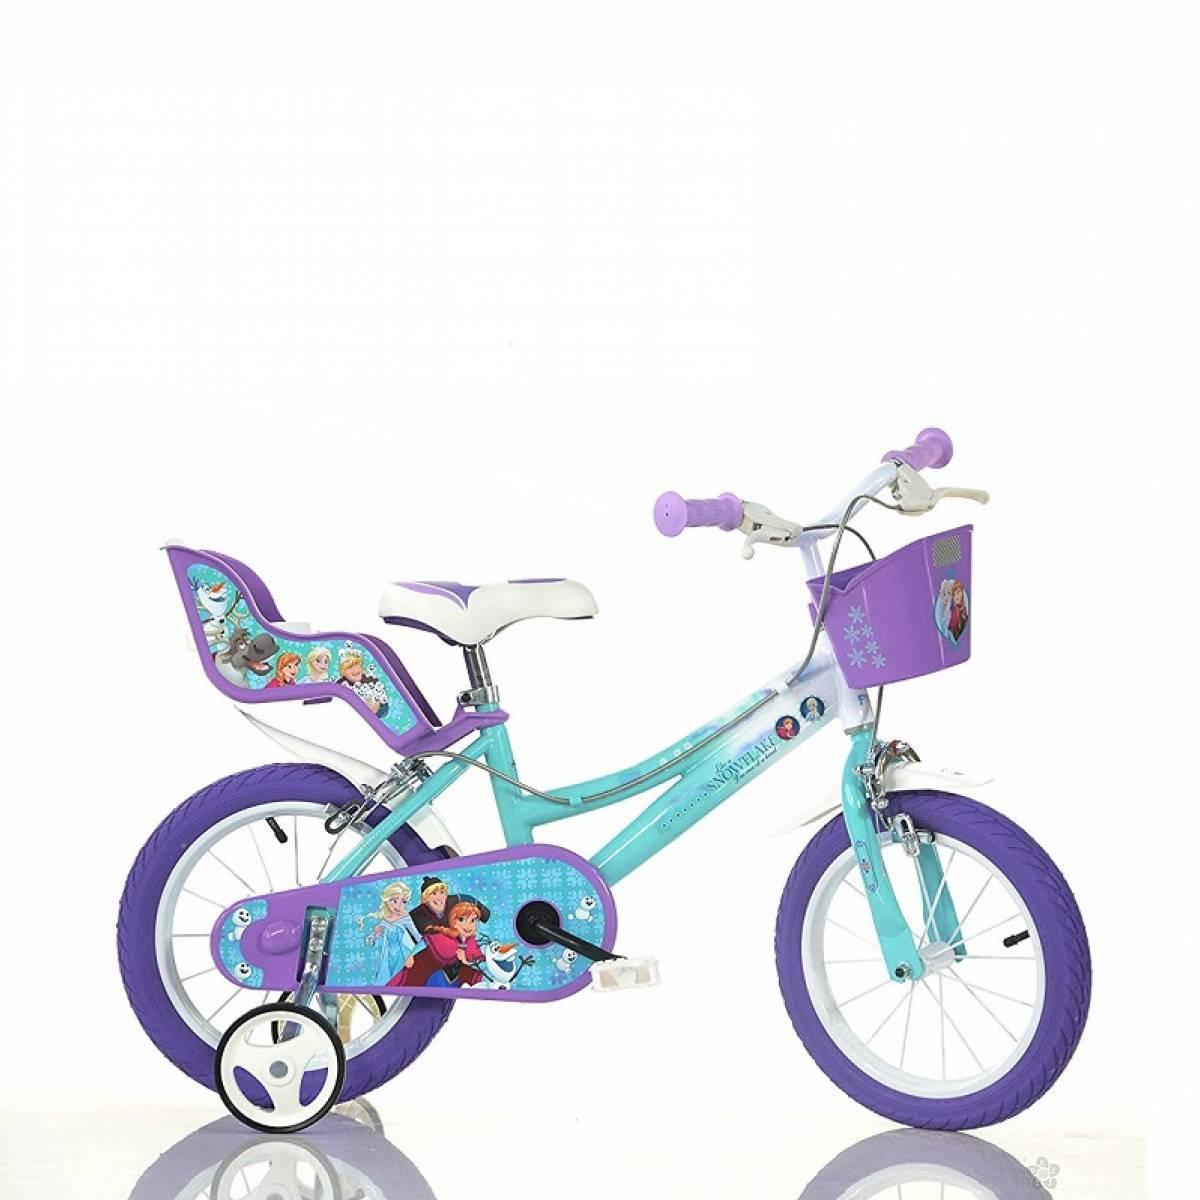 Dečiji Bicikl Snow Princess model 716-12 PINK